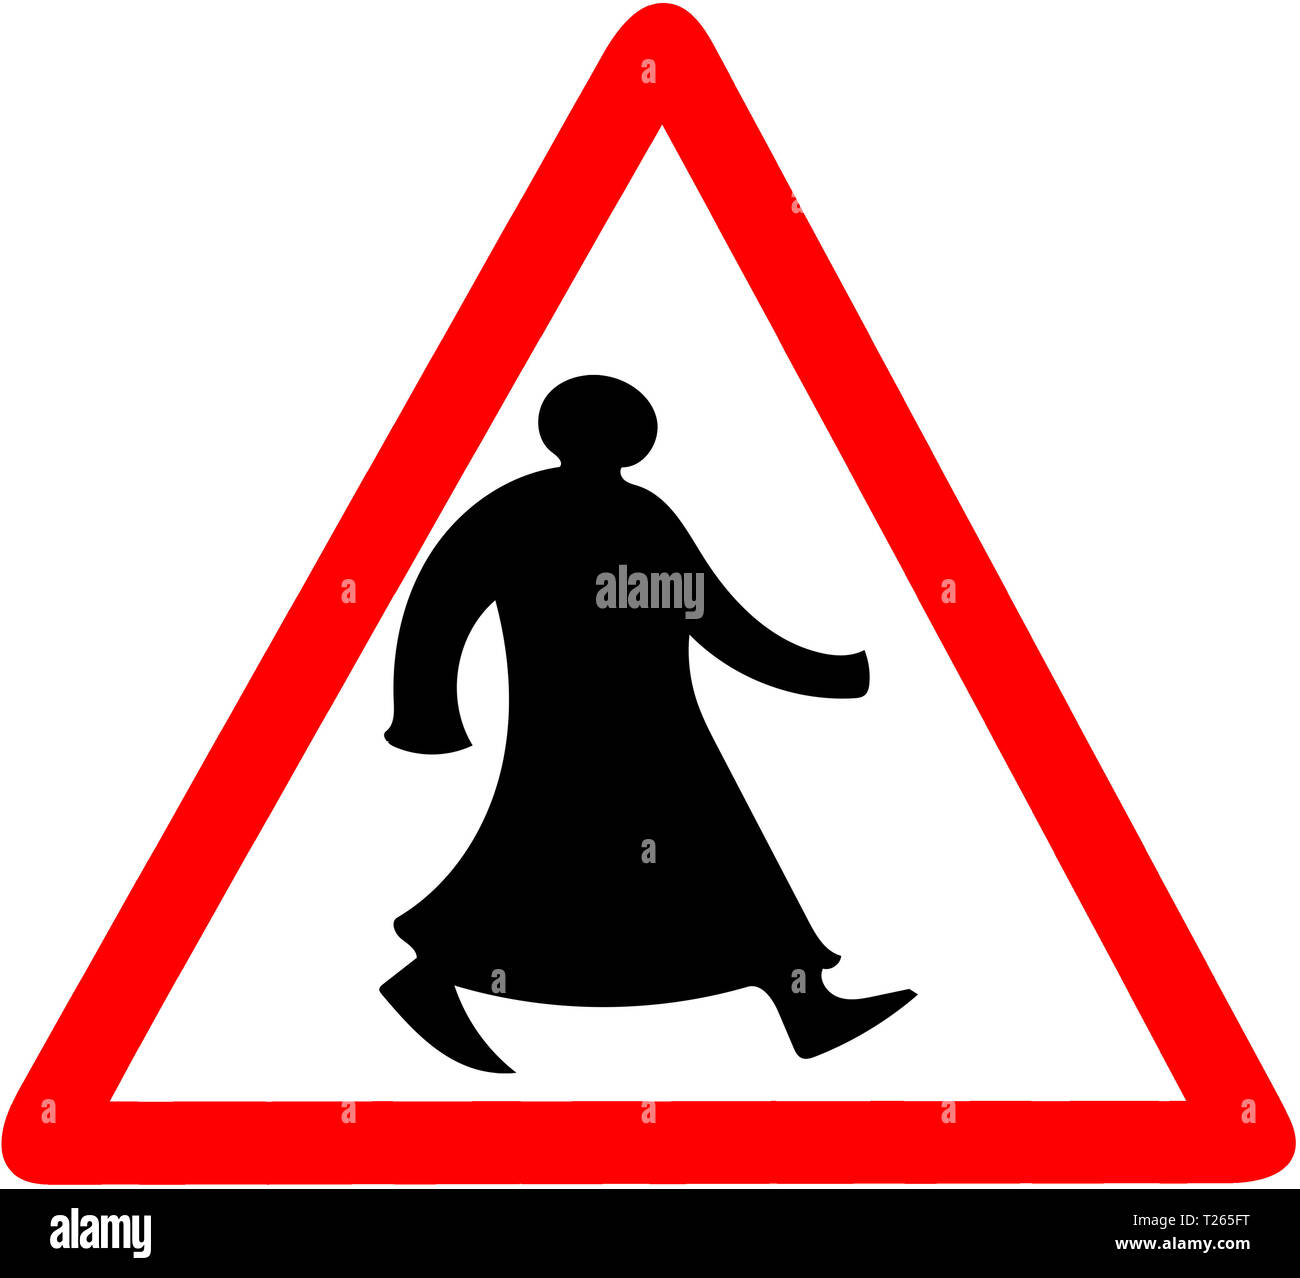 Walking arab tiangular road sign warning caution isolated. - Stock Image